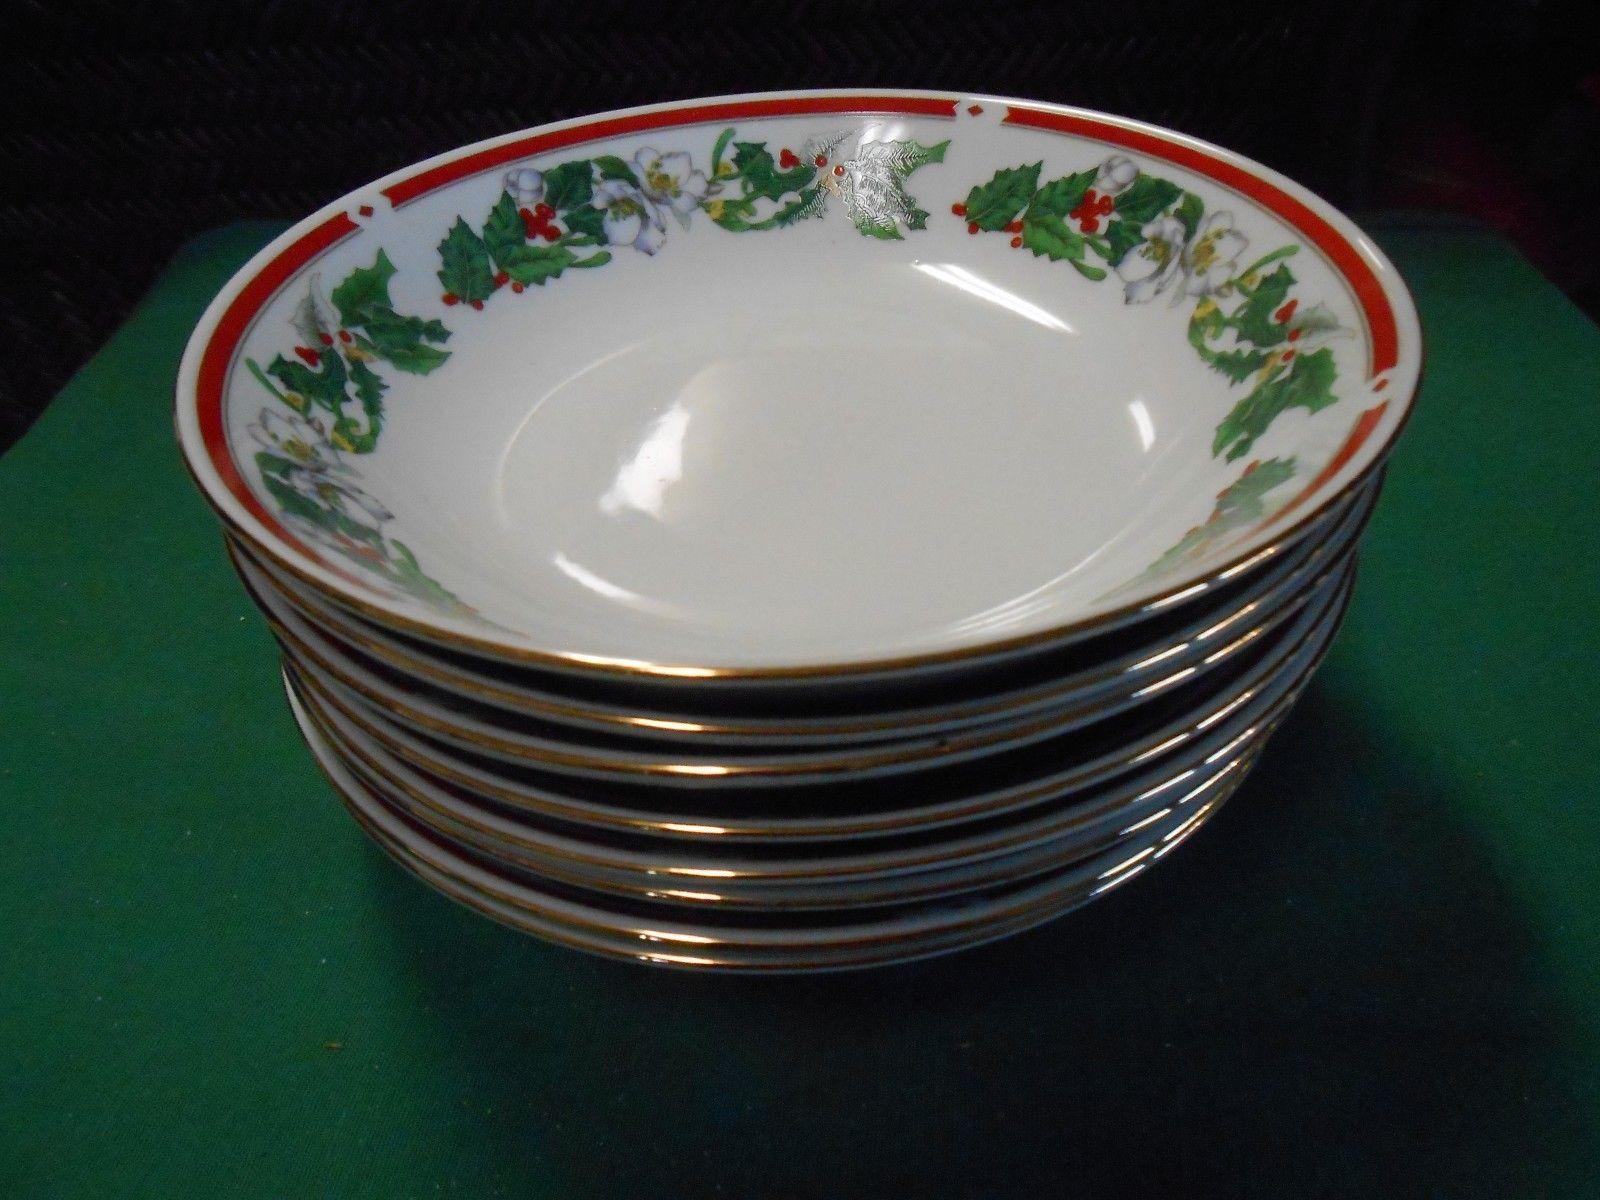 Vintage LYNNS Fine China ST.MARIA Christmas Dinnerware Set of 8 SOUP BOWLS & Vintage Lynns Fine China St.Maria Christmas and 50 similar items